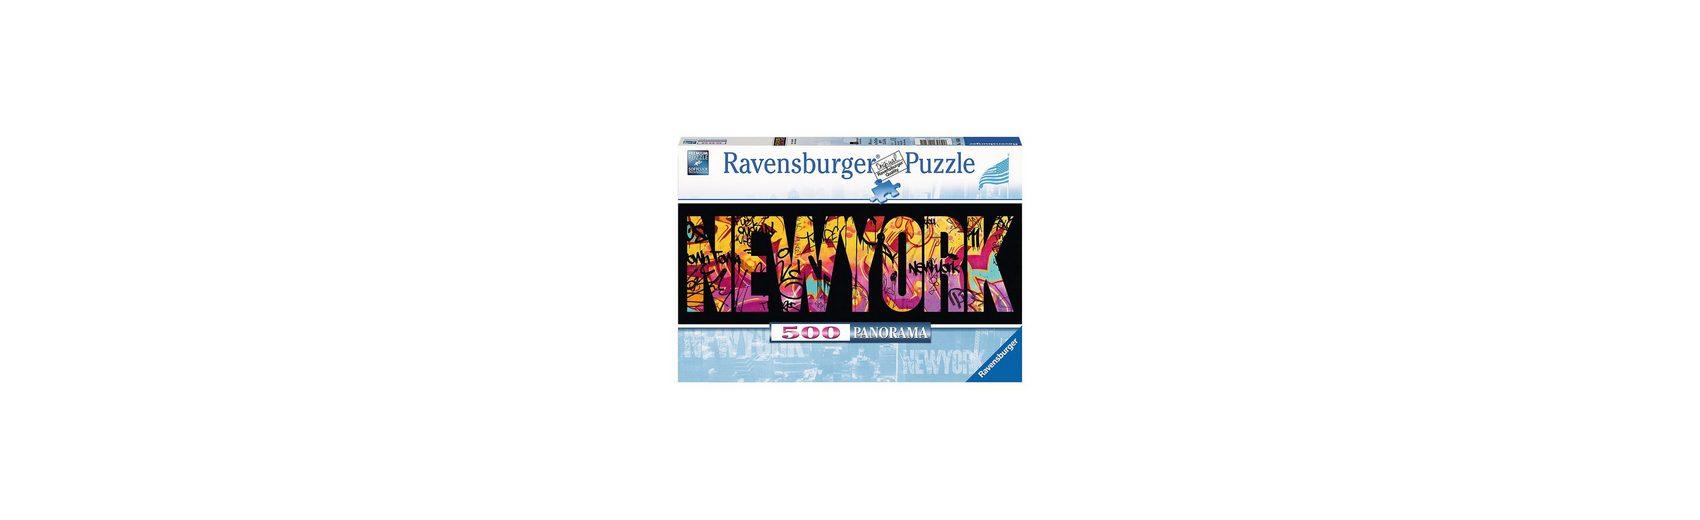 Ravensburger 500 Teile Panorama New York Graffiti - Panorama